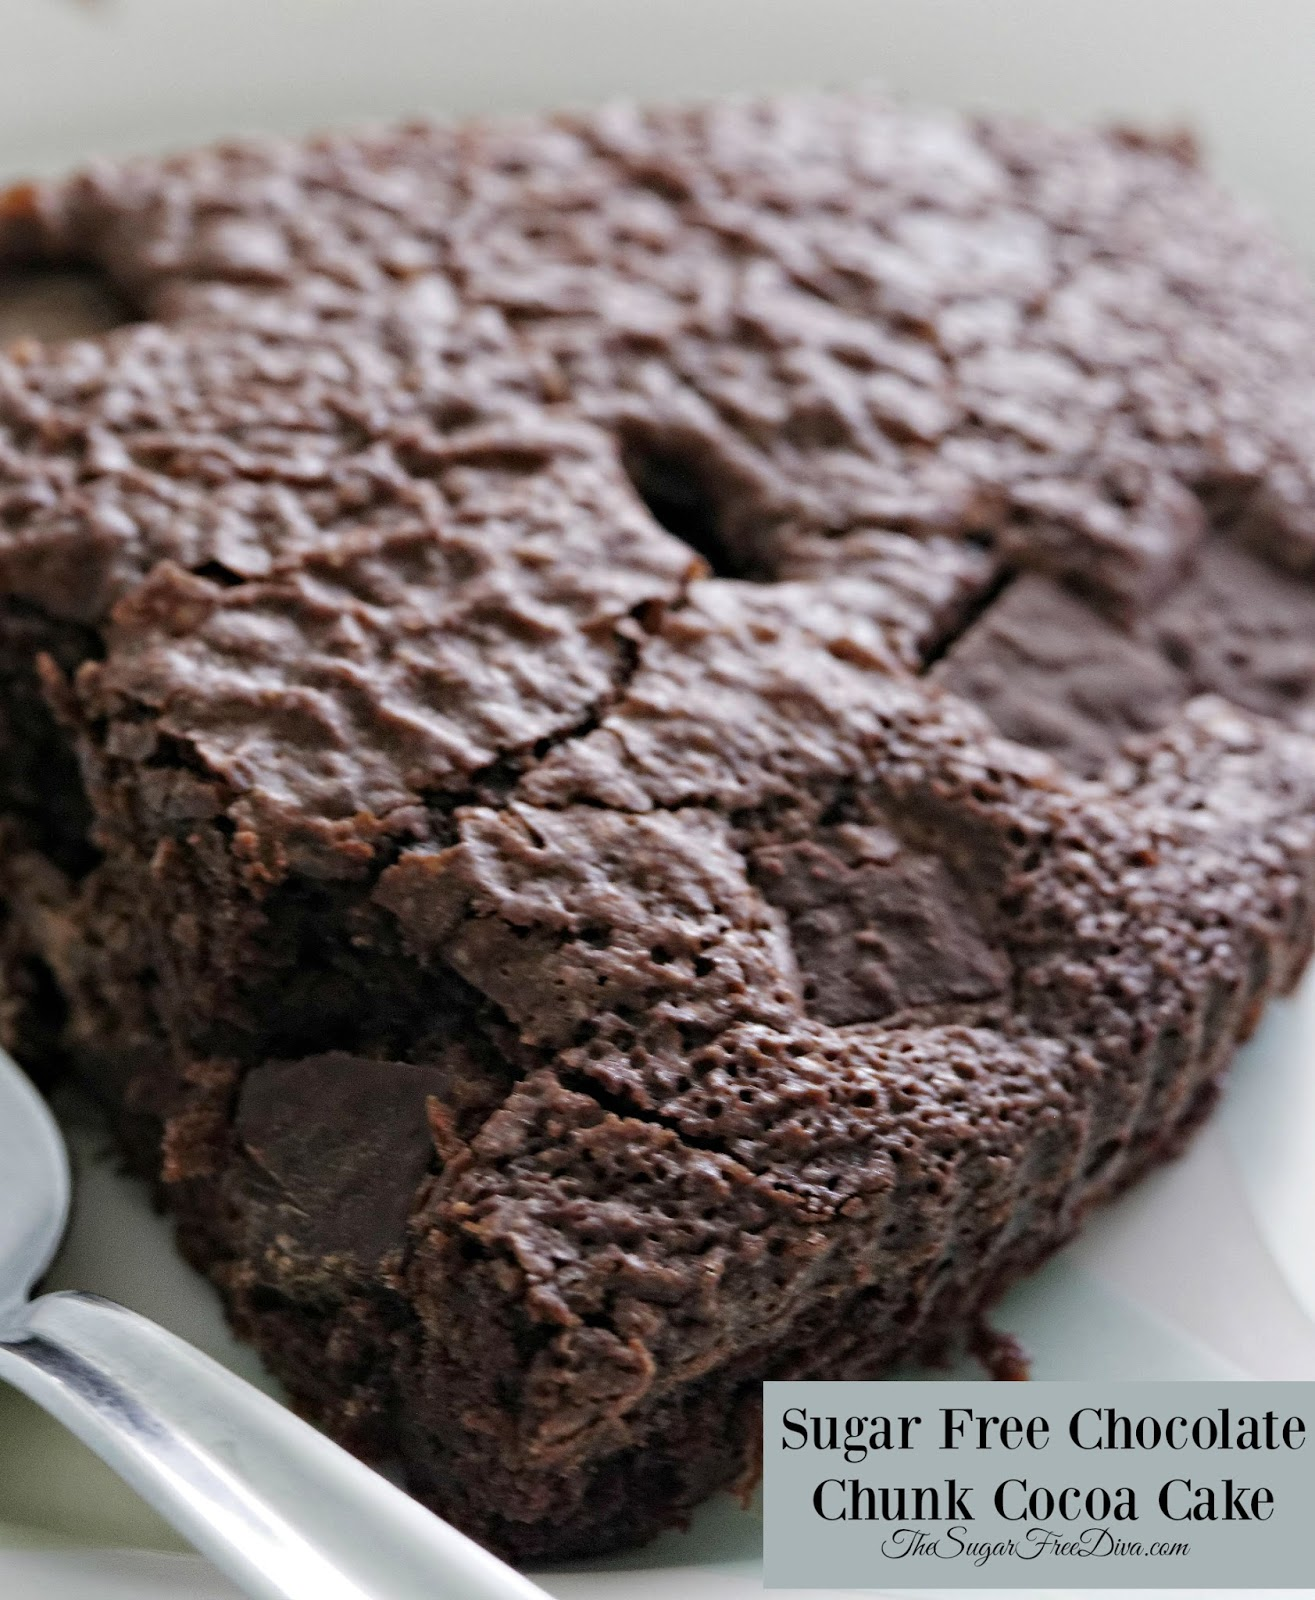 Sugar Free Chocolate Chunk Cocoa Cake - THE SUGAR FREE DIVA